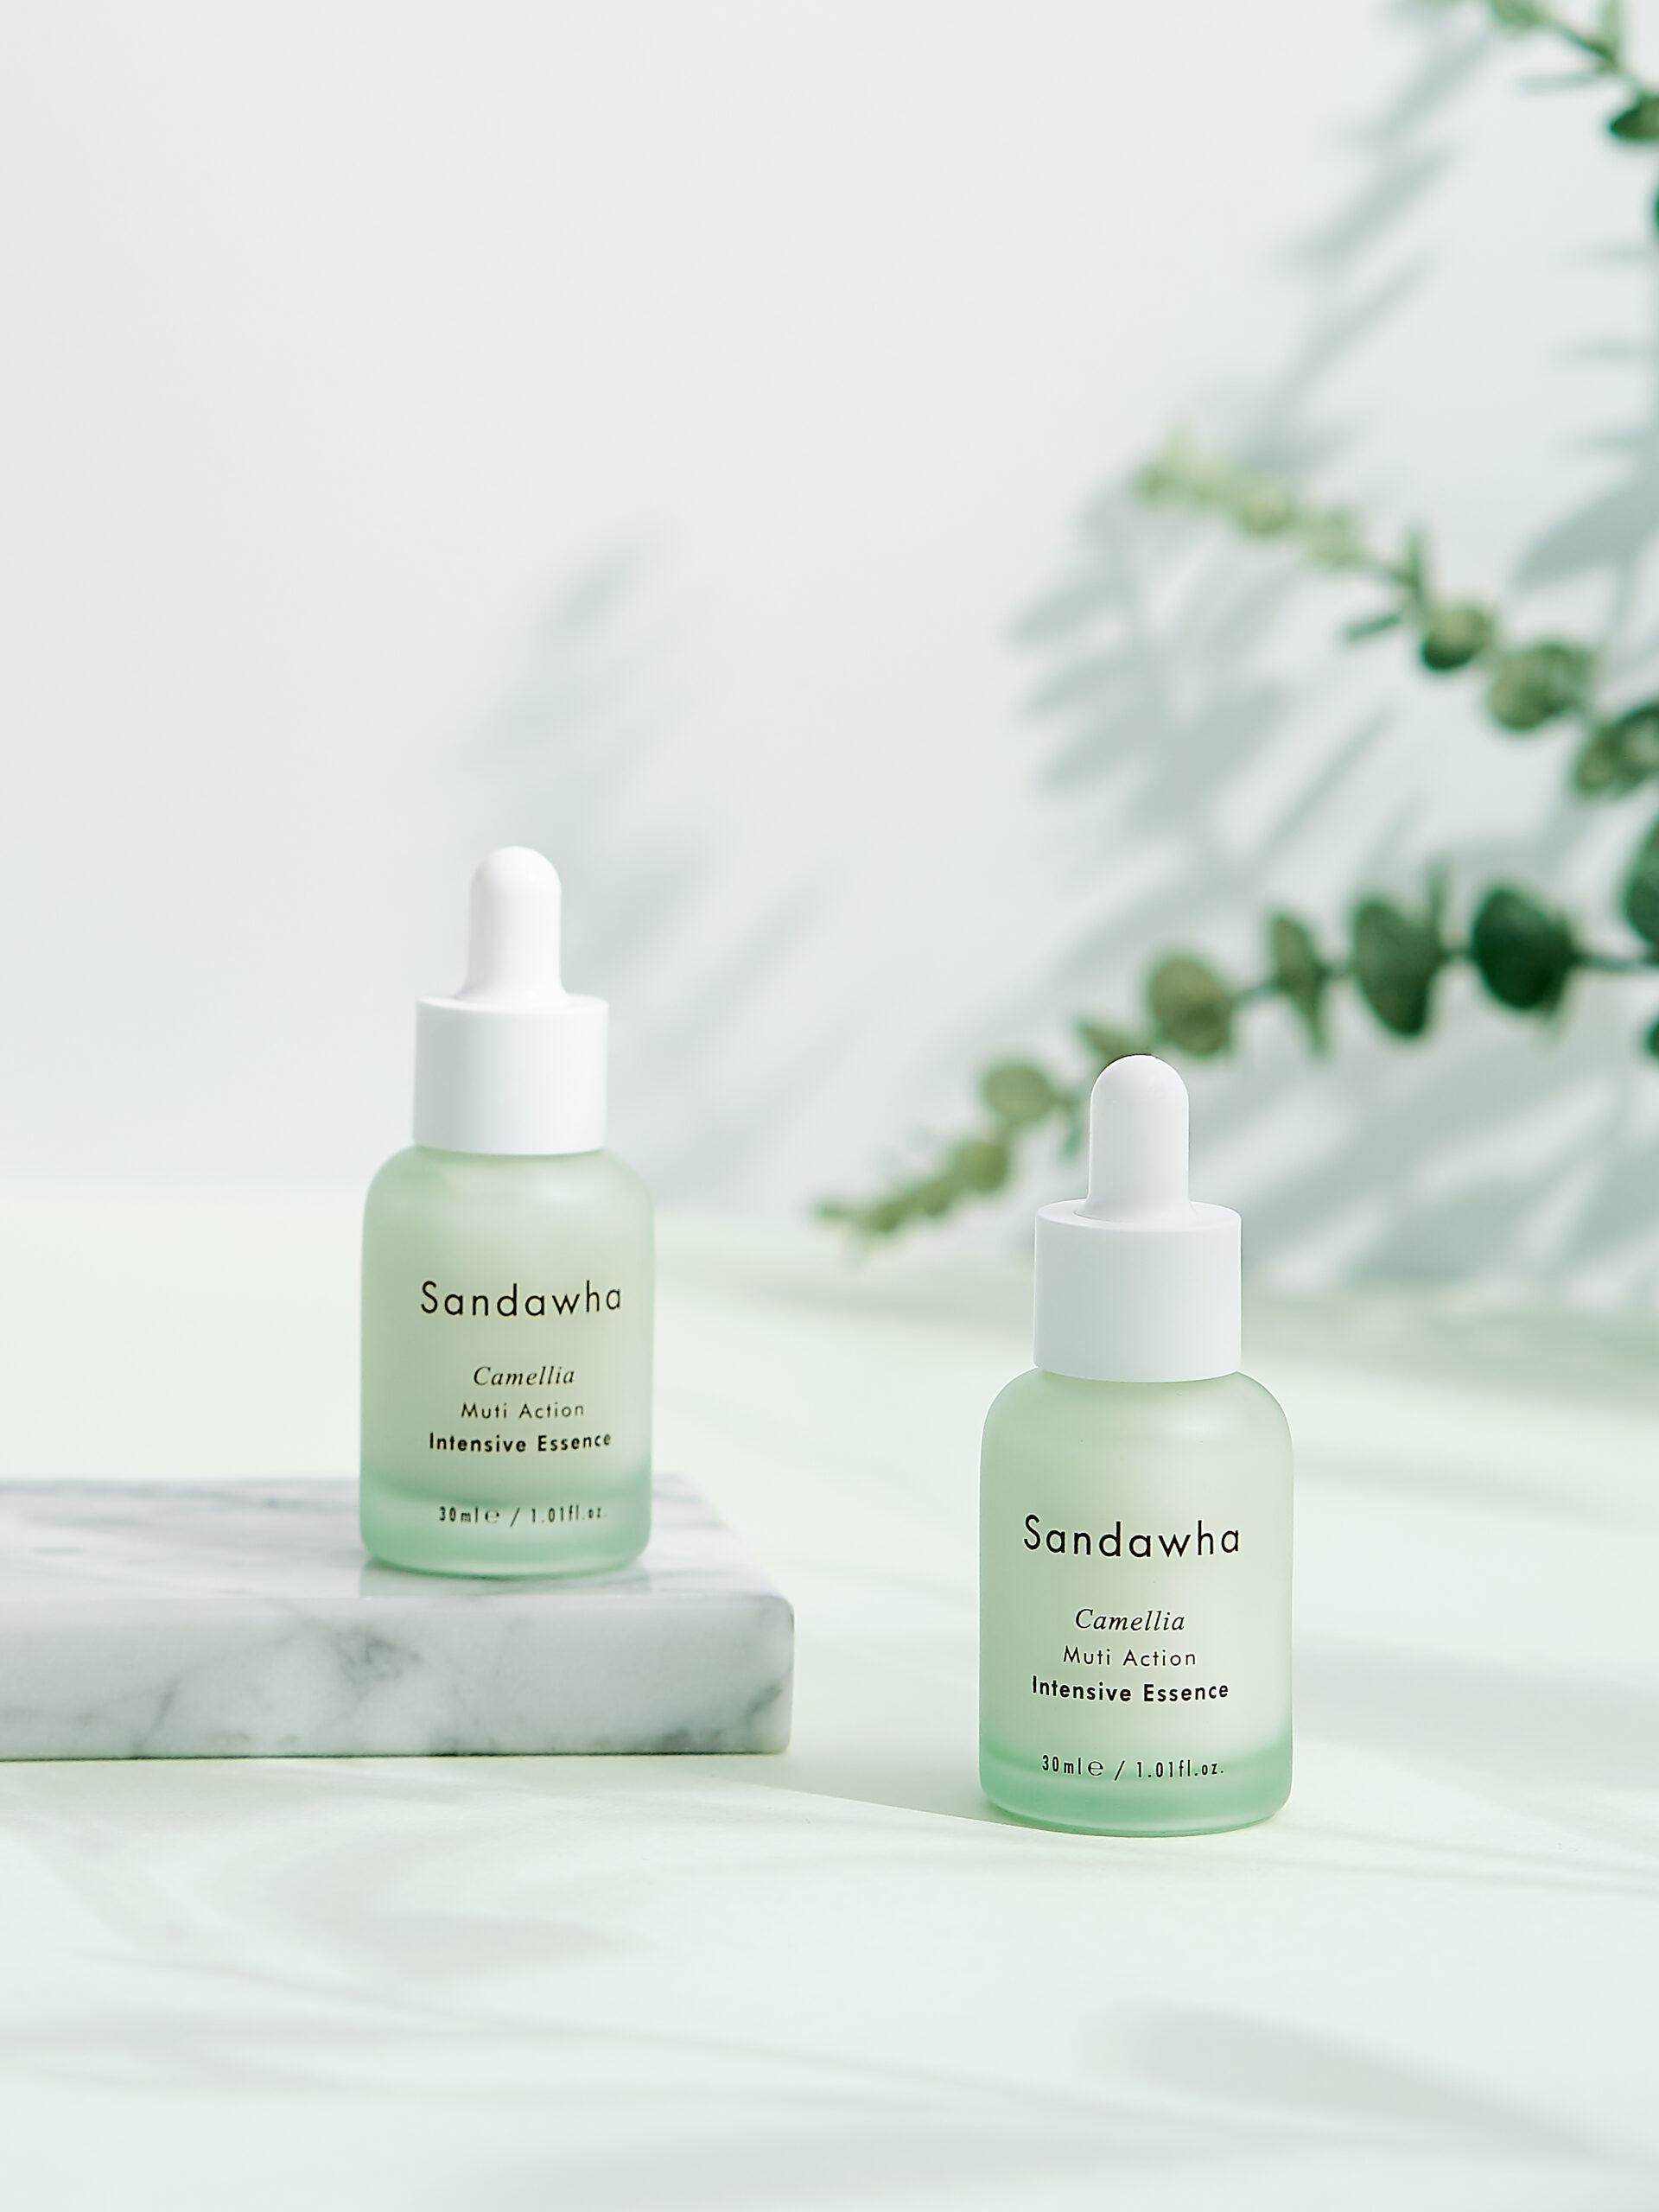 Cruelty-Free Beauty Brands Vegan Organic Sandawha Camellia Multiaction Essence